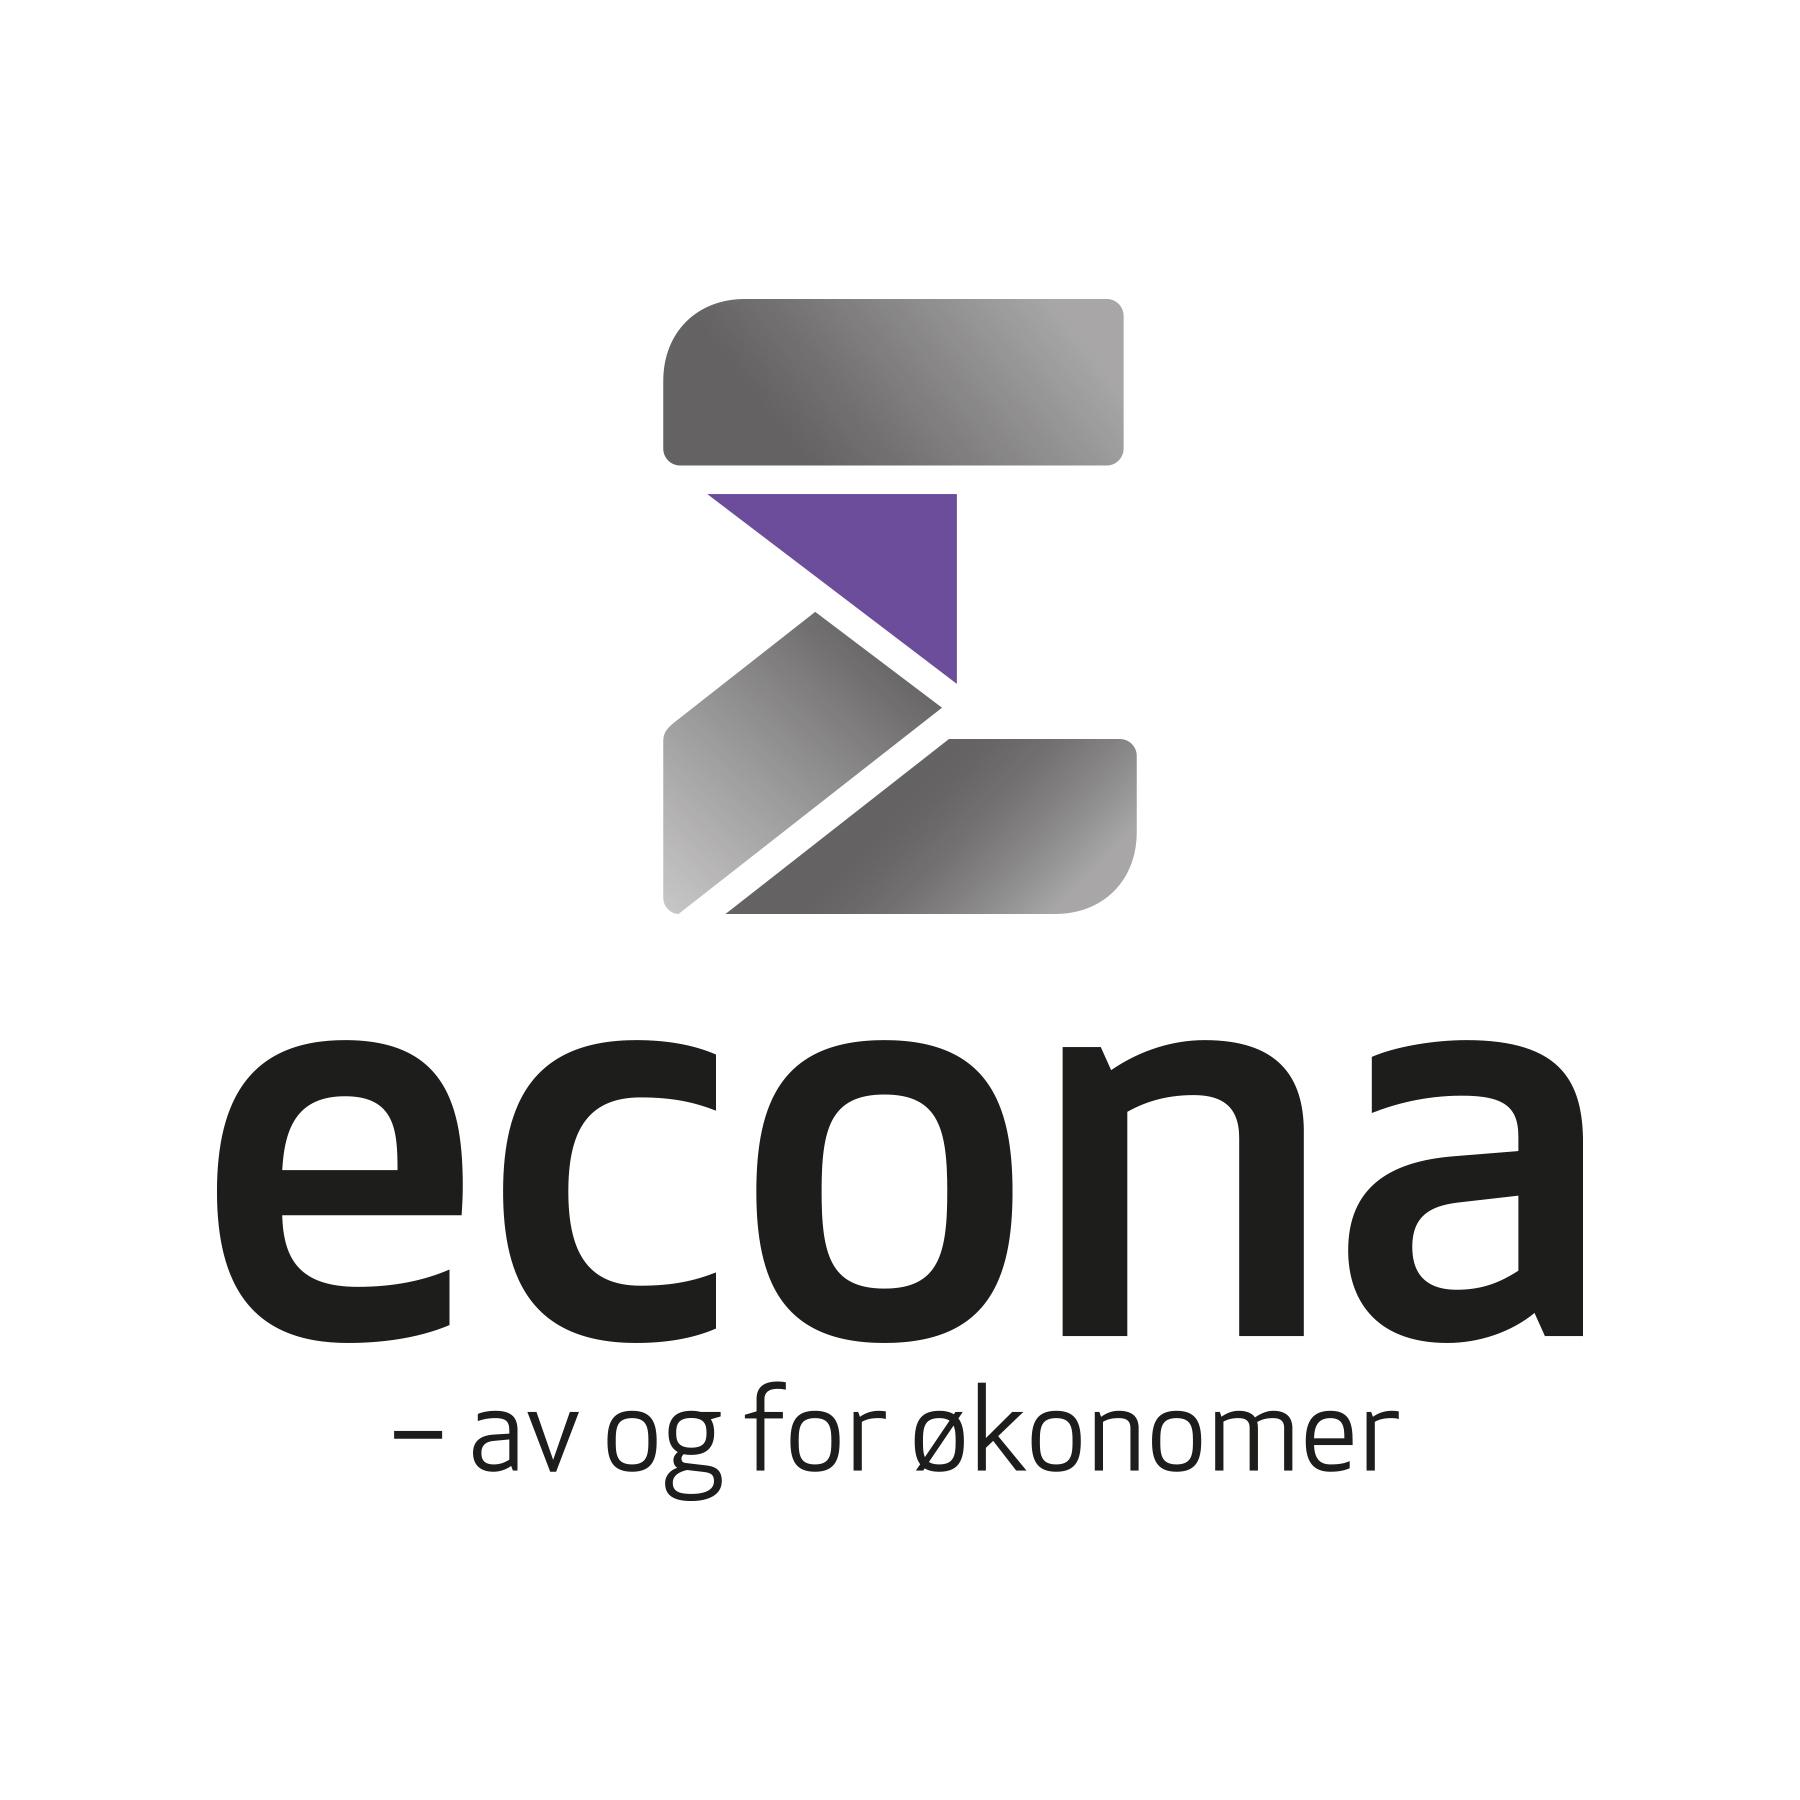 Econa logo